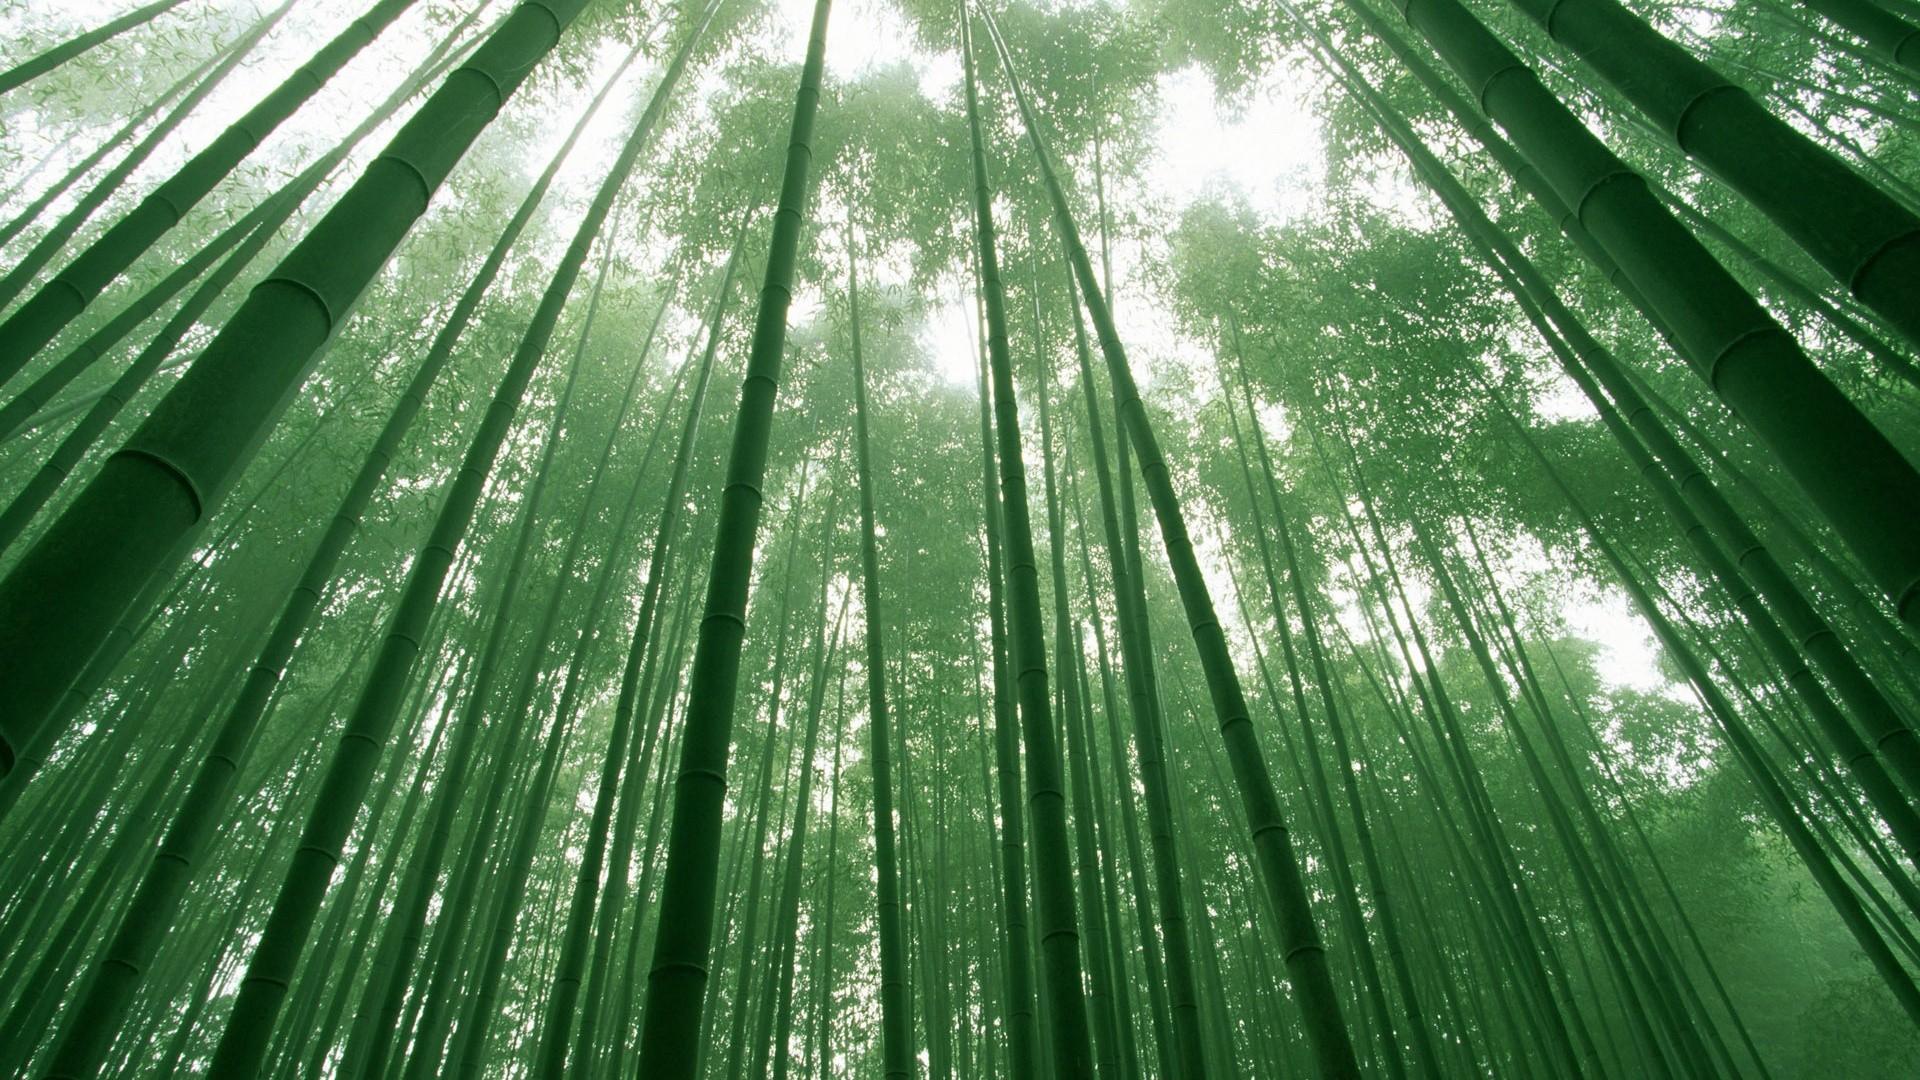 Bamboo HD Wallpaper